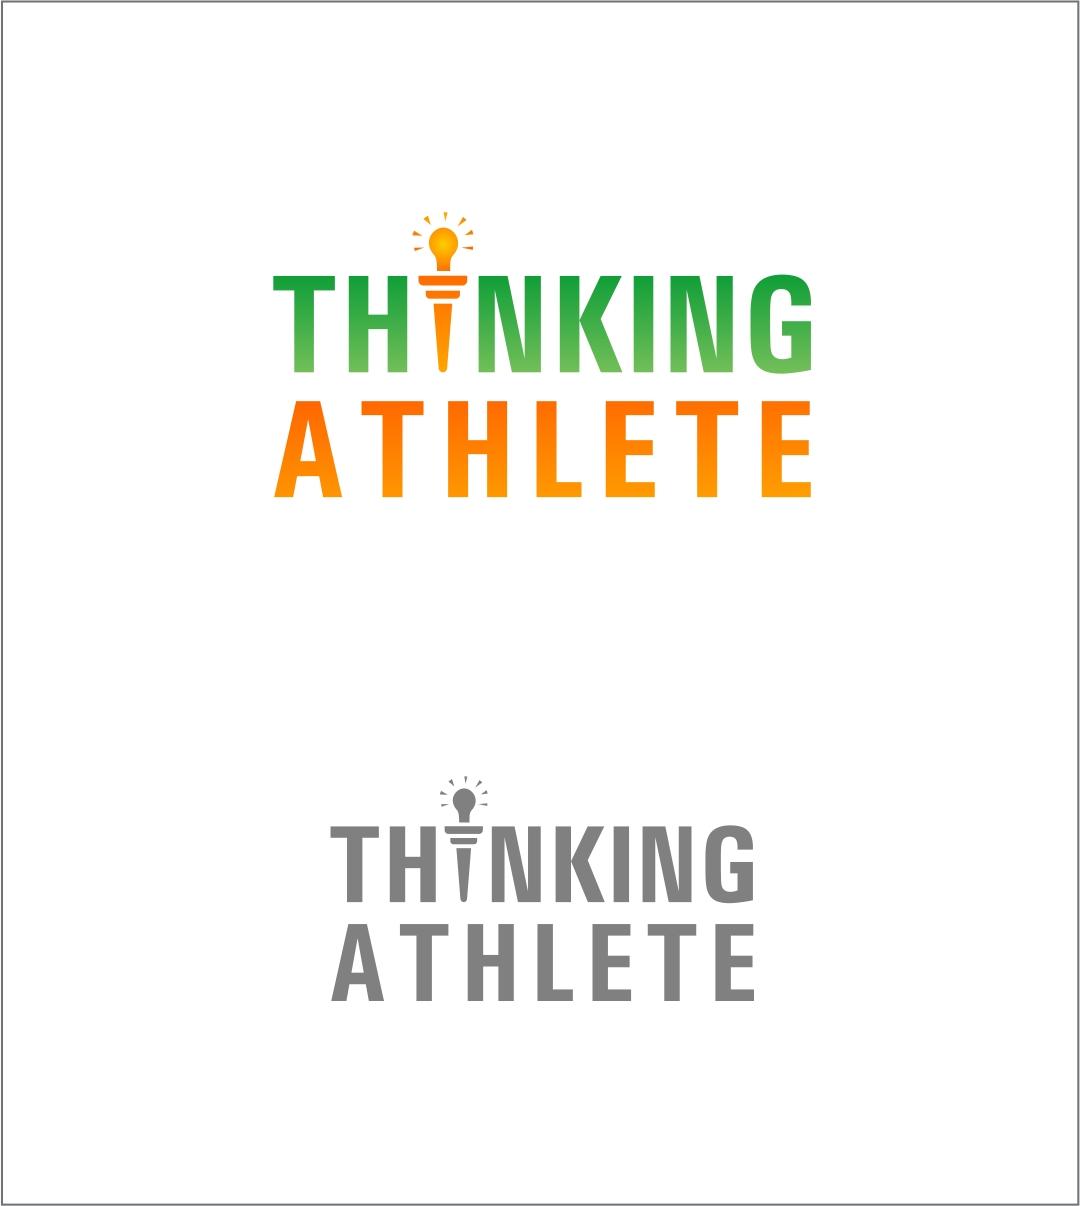 Logo Design by haidu - Entry No. 86 in the Logo Design Contest Thinking Athlete Logo Design.